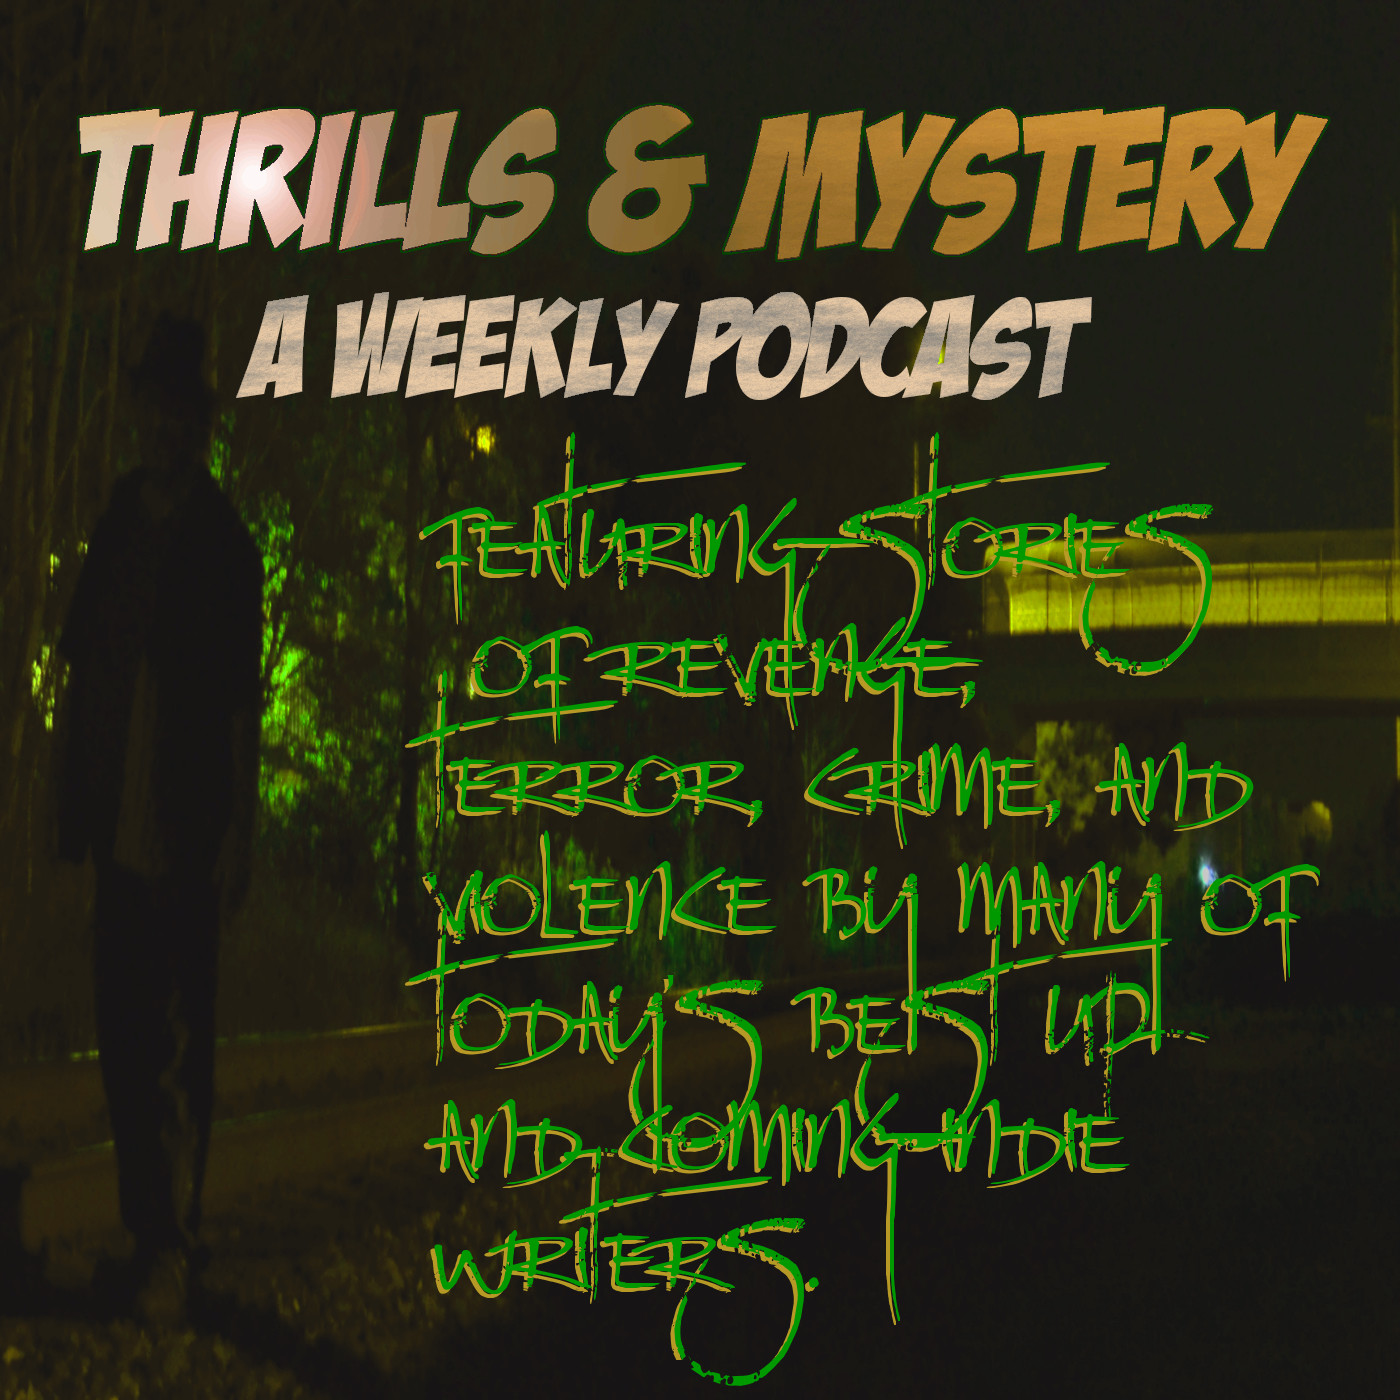 thrillsandmystery's podcast show art